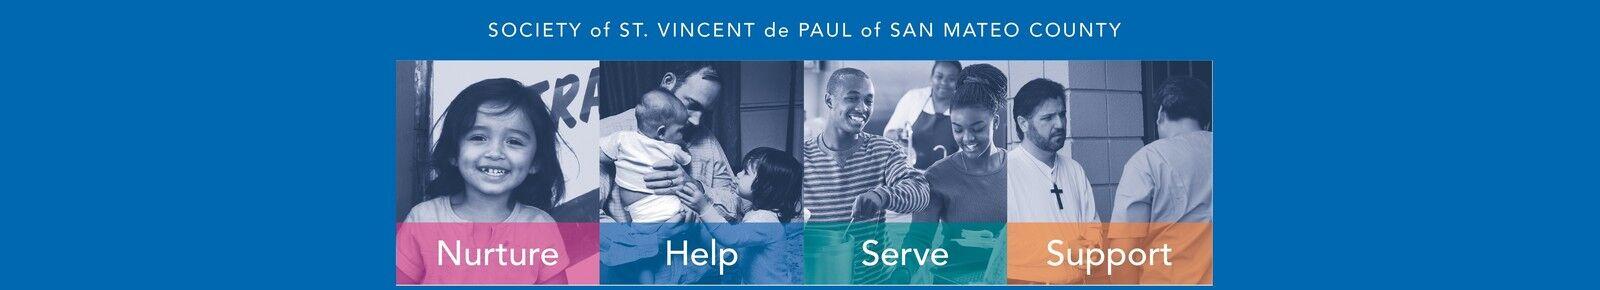 SVdP of San Mateo